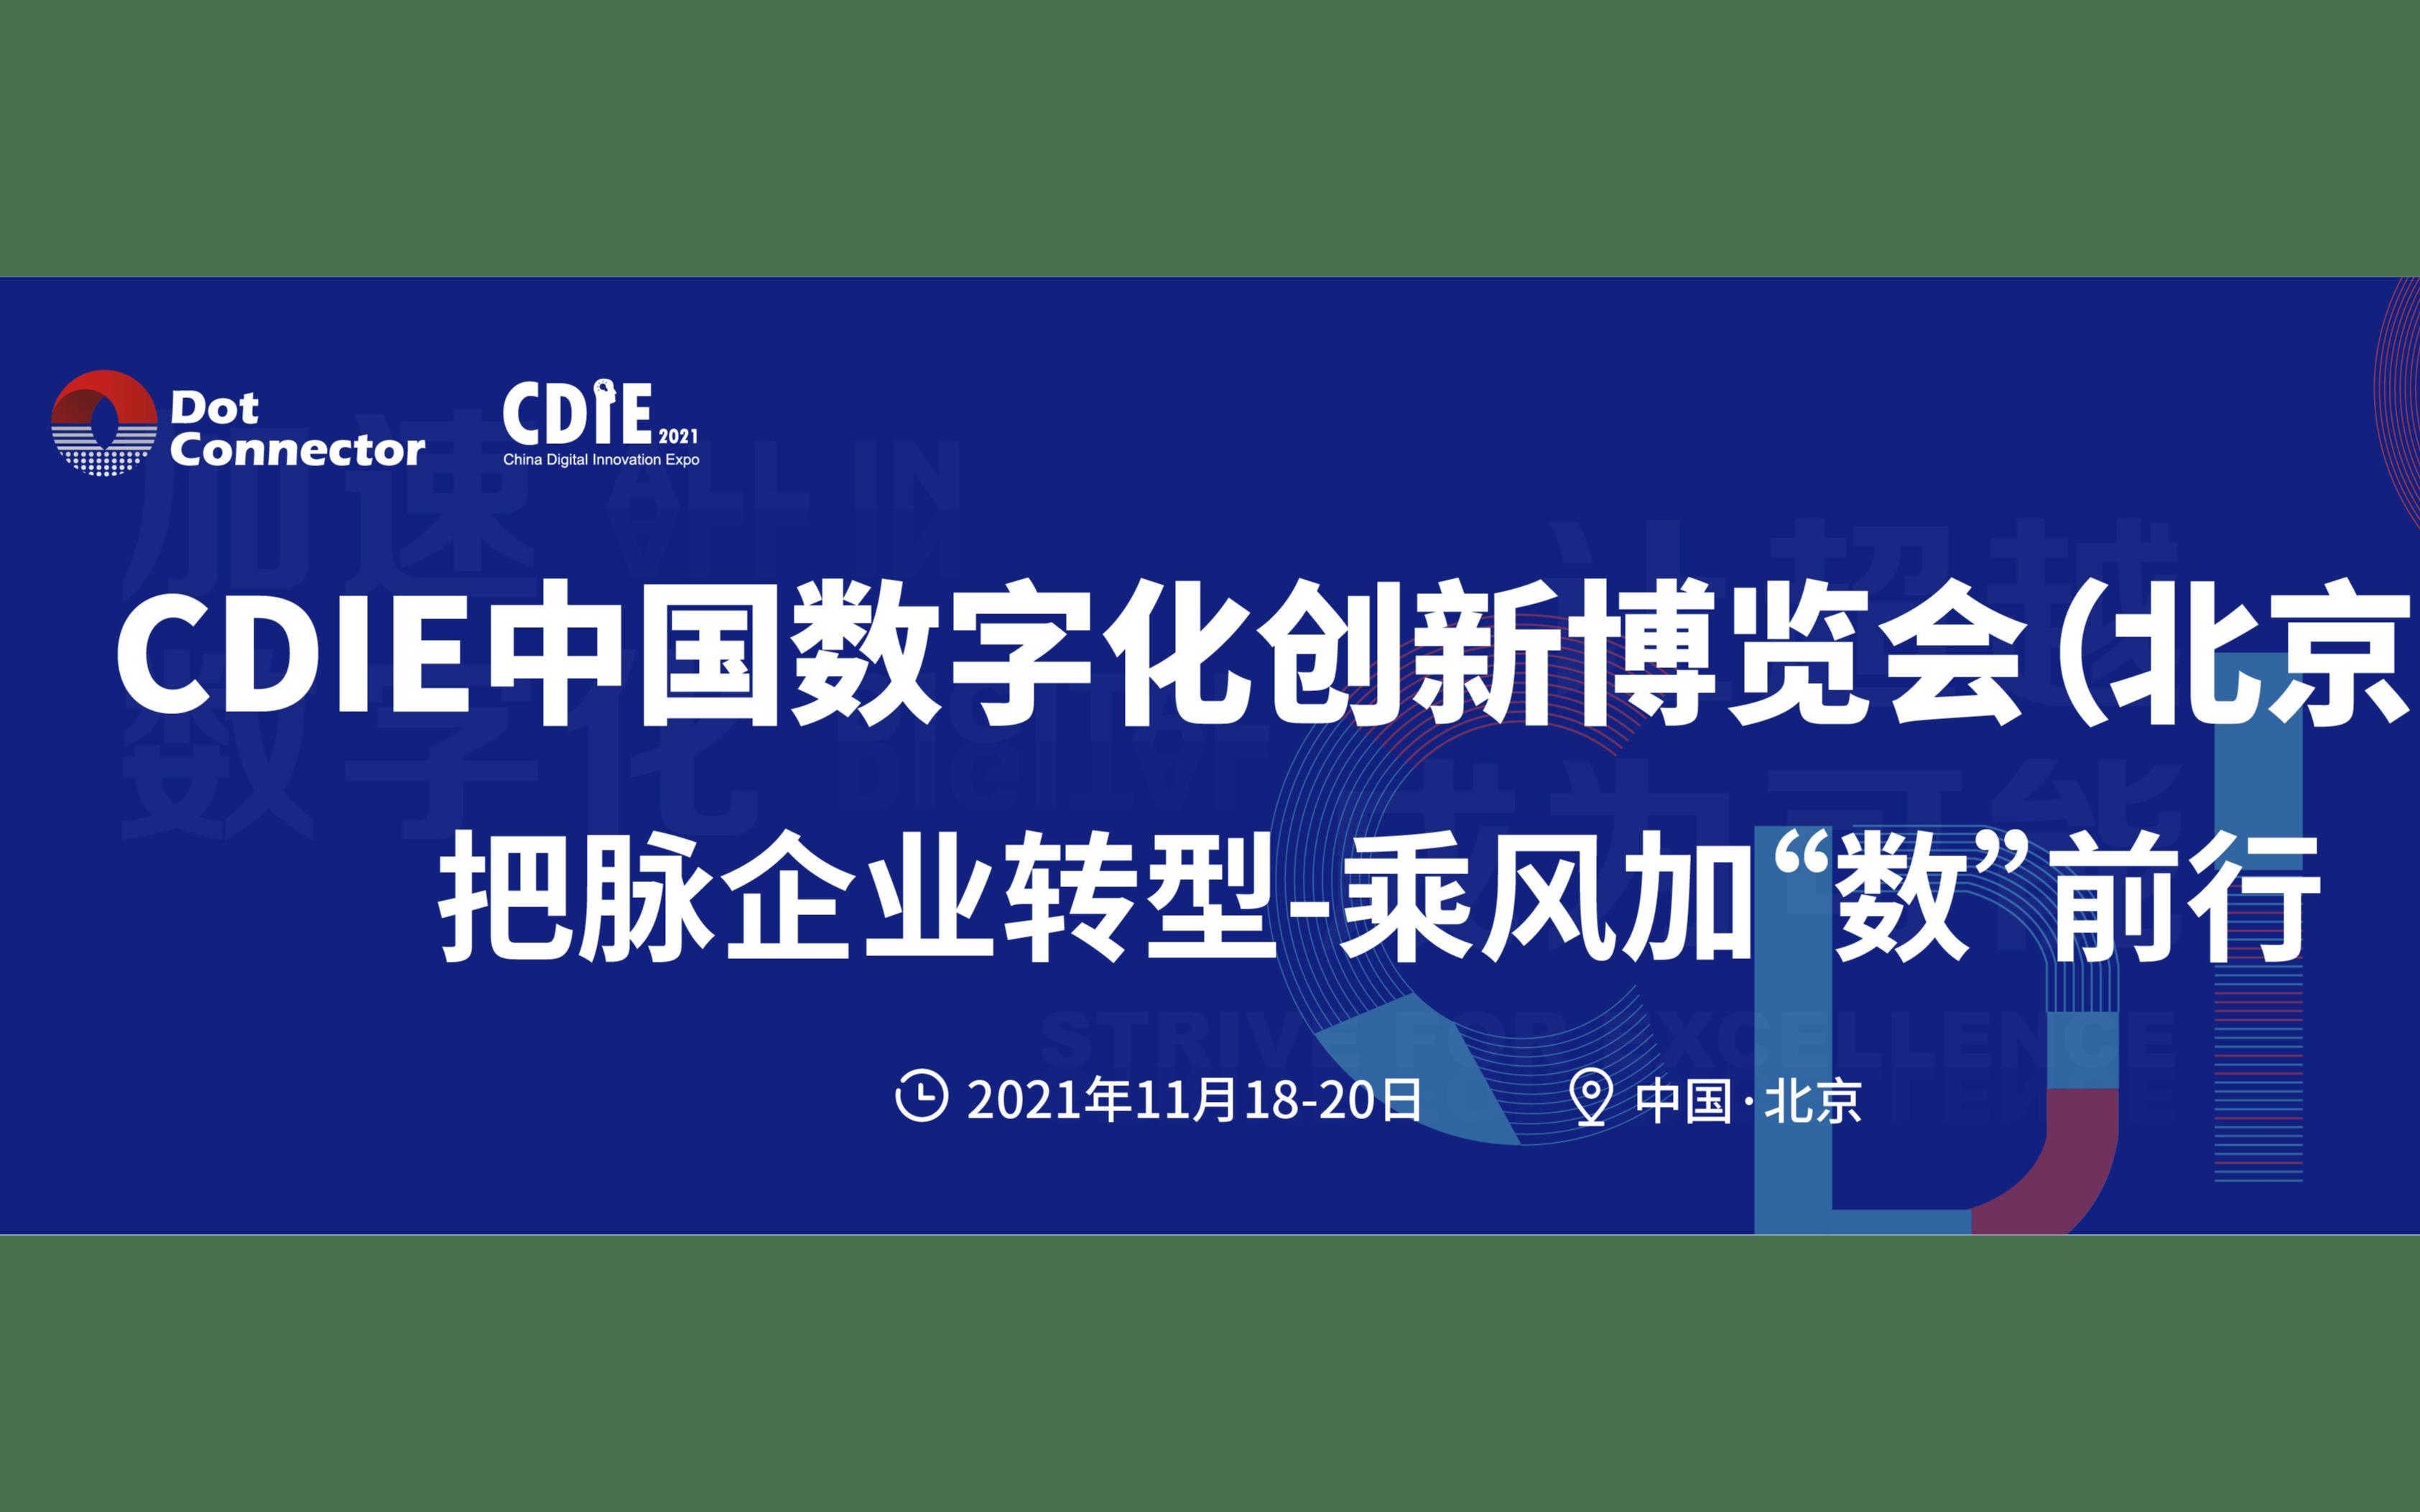 CDIE中国数字化创新博览会 · 北京站